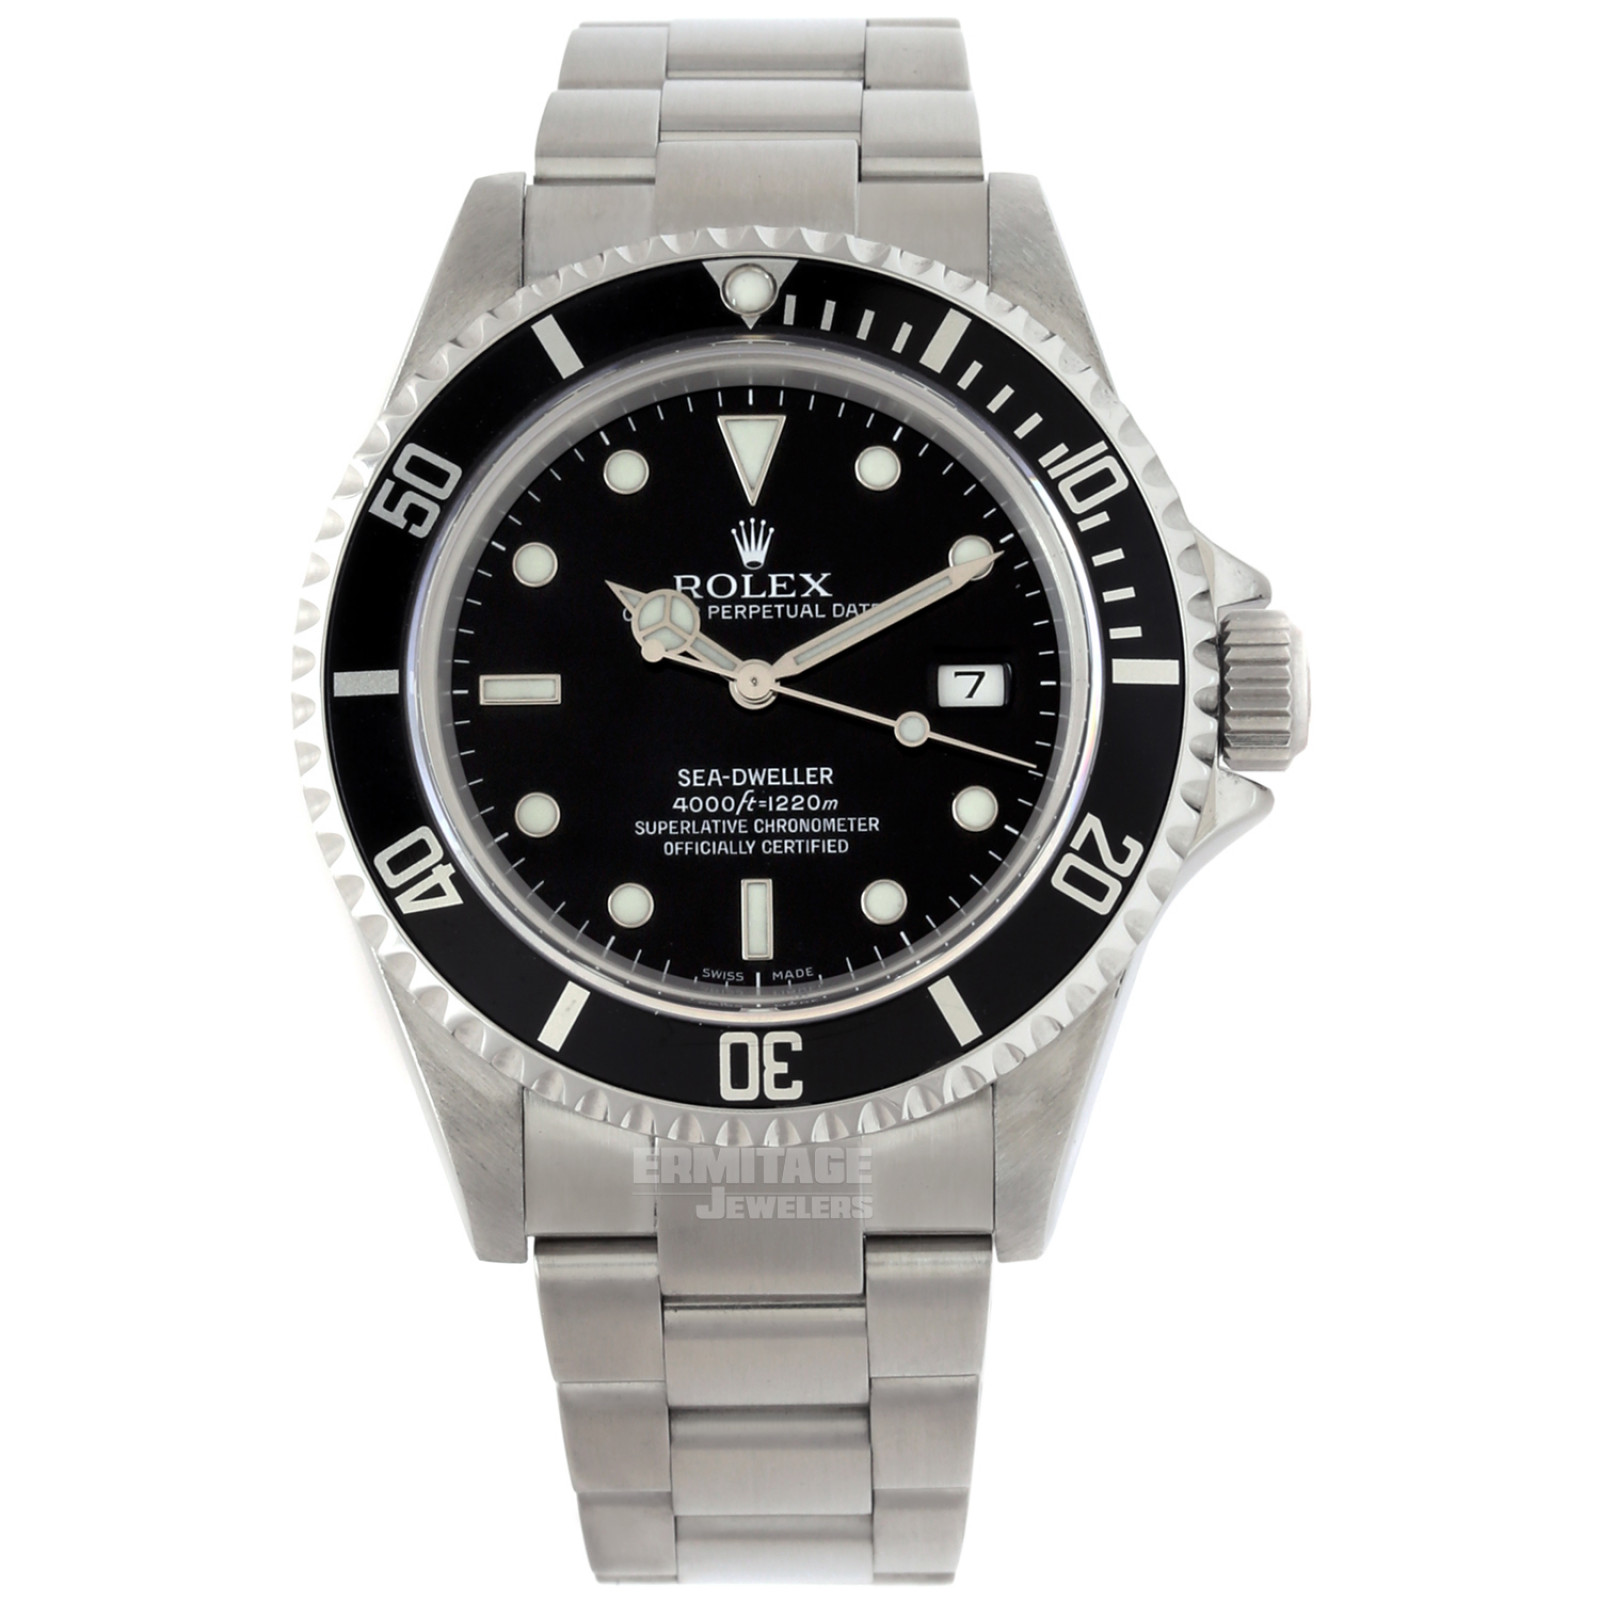 Rolex Oyster Perpetual Sea-Dweller 16600 Steel Year 2003